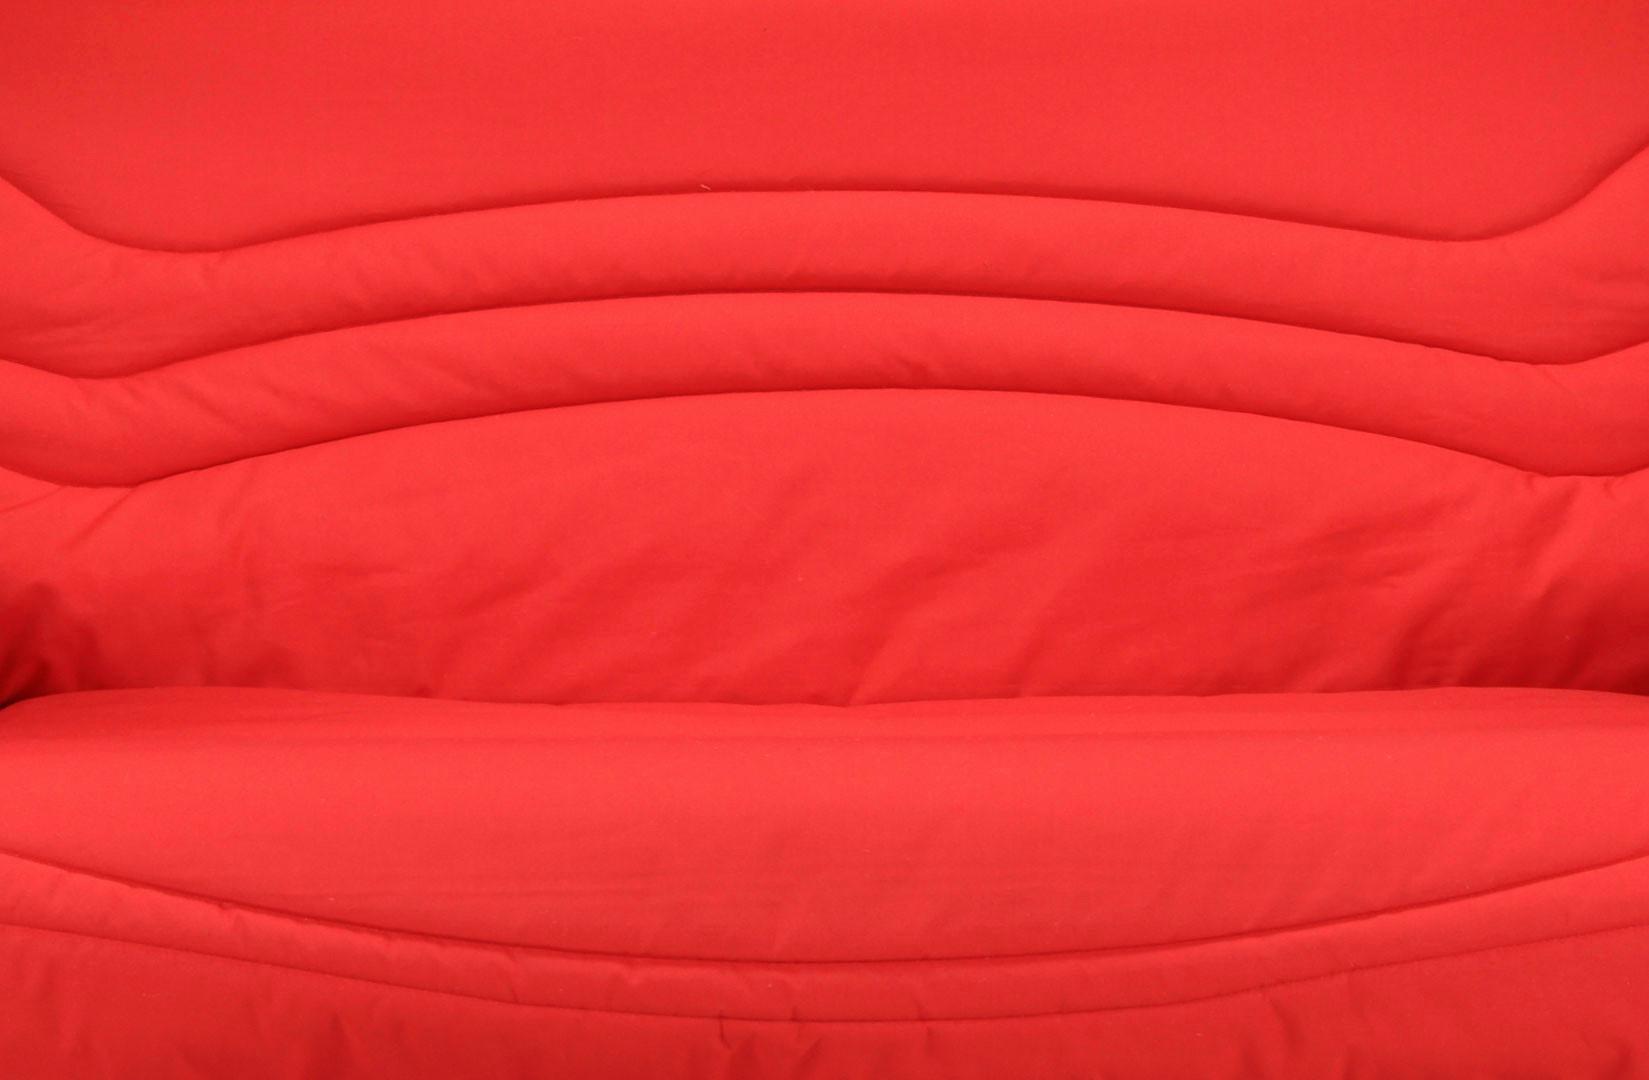 housse pour clic clac ikea inspirant image matelas design. Black Bedroom Furniture Sets. Home Design Ideas